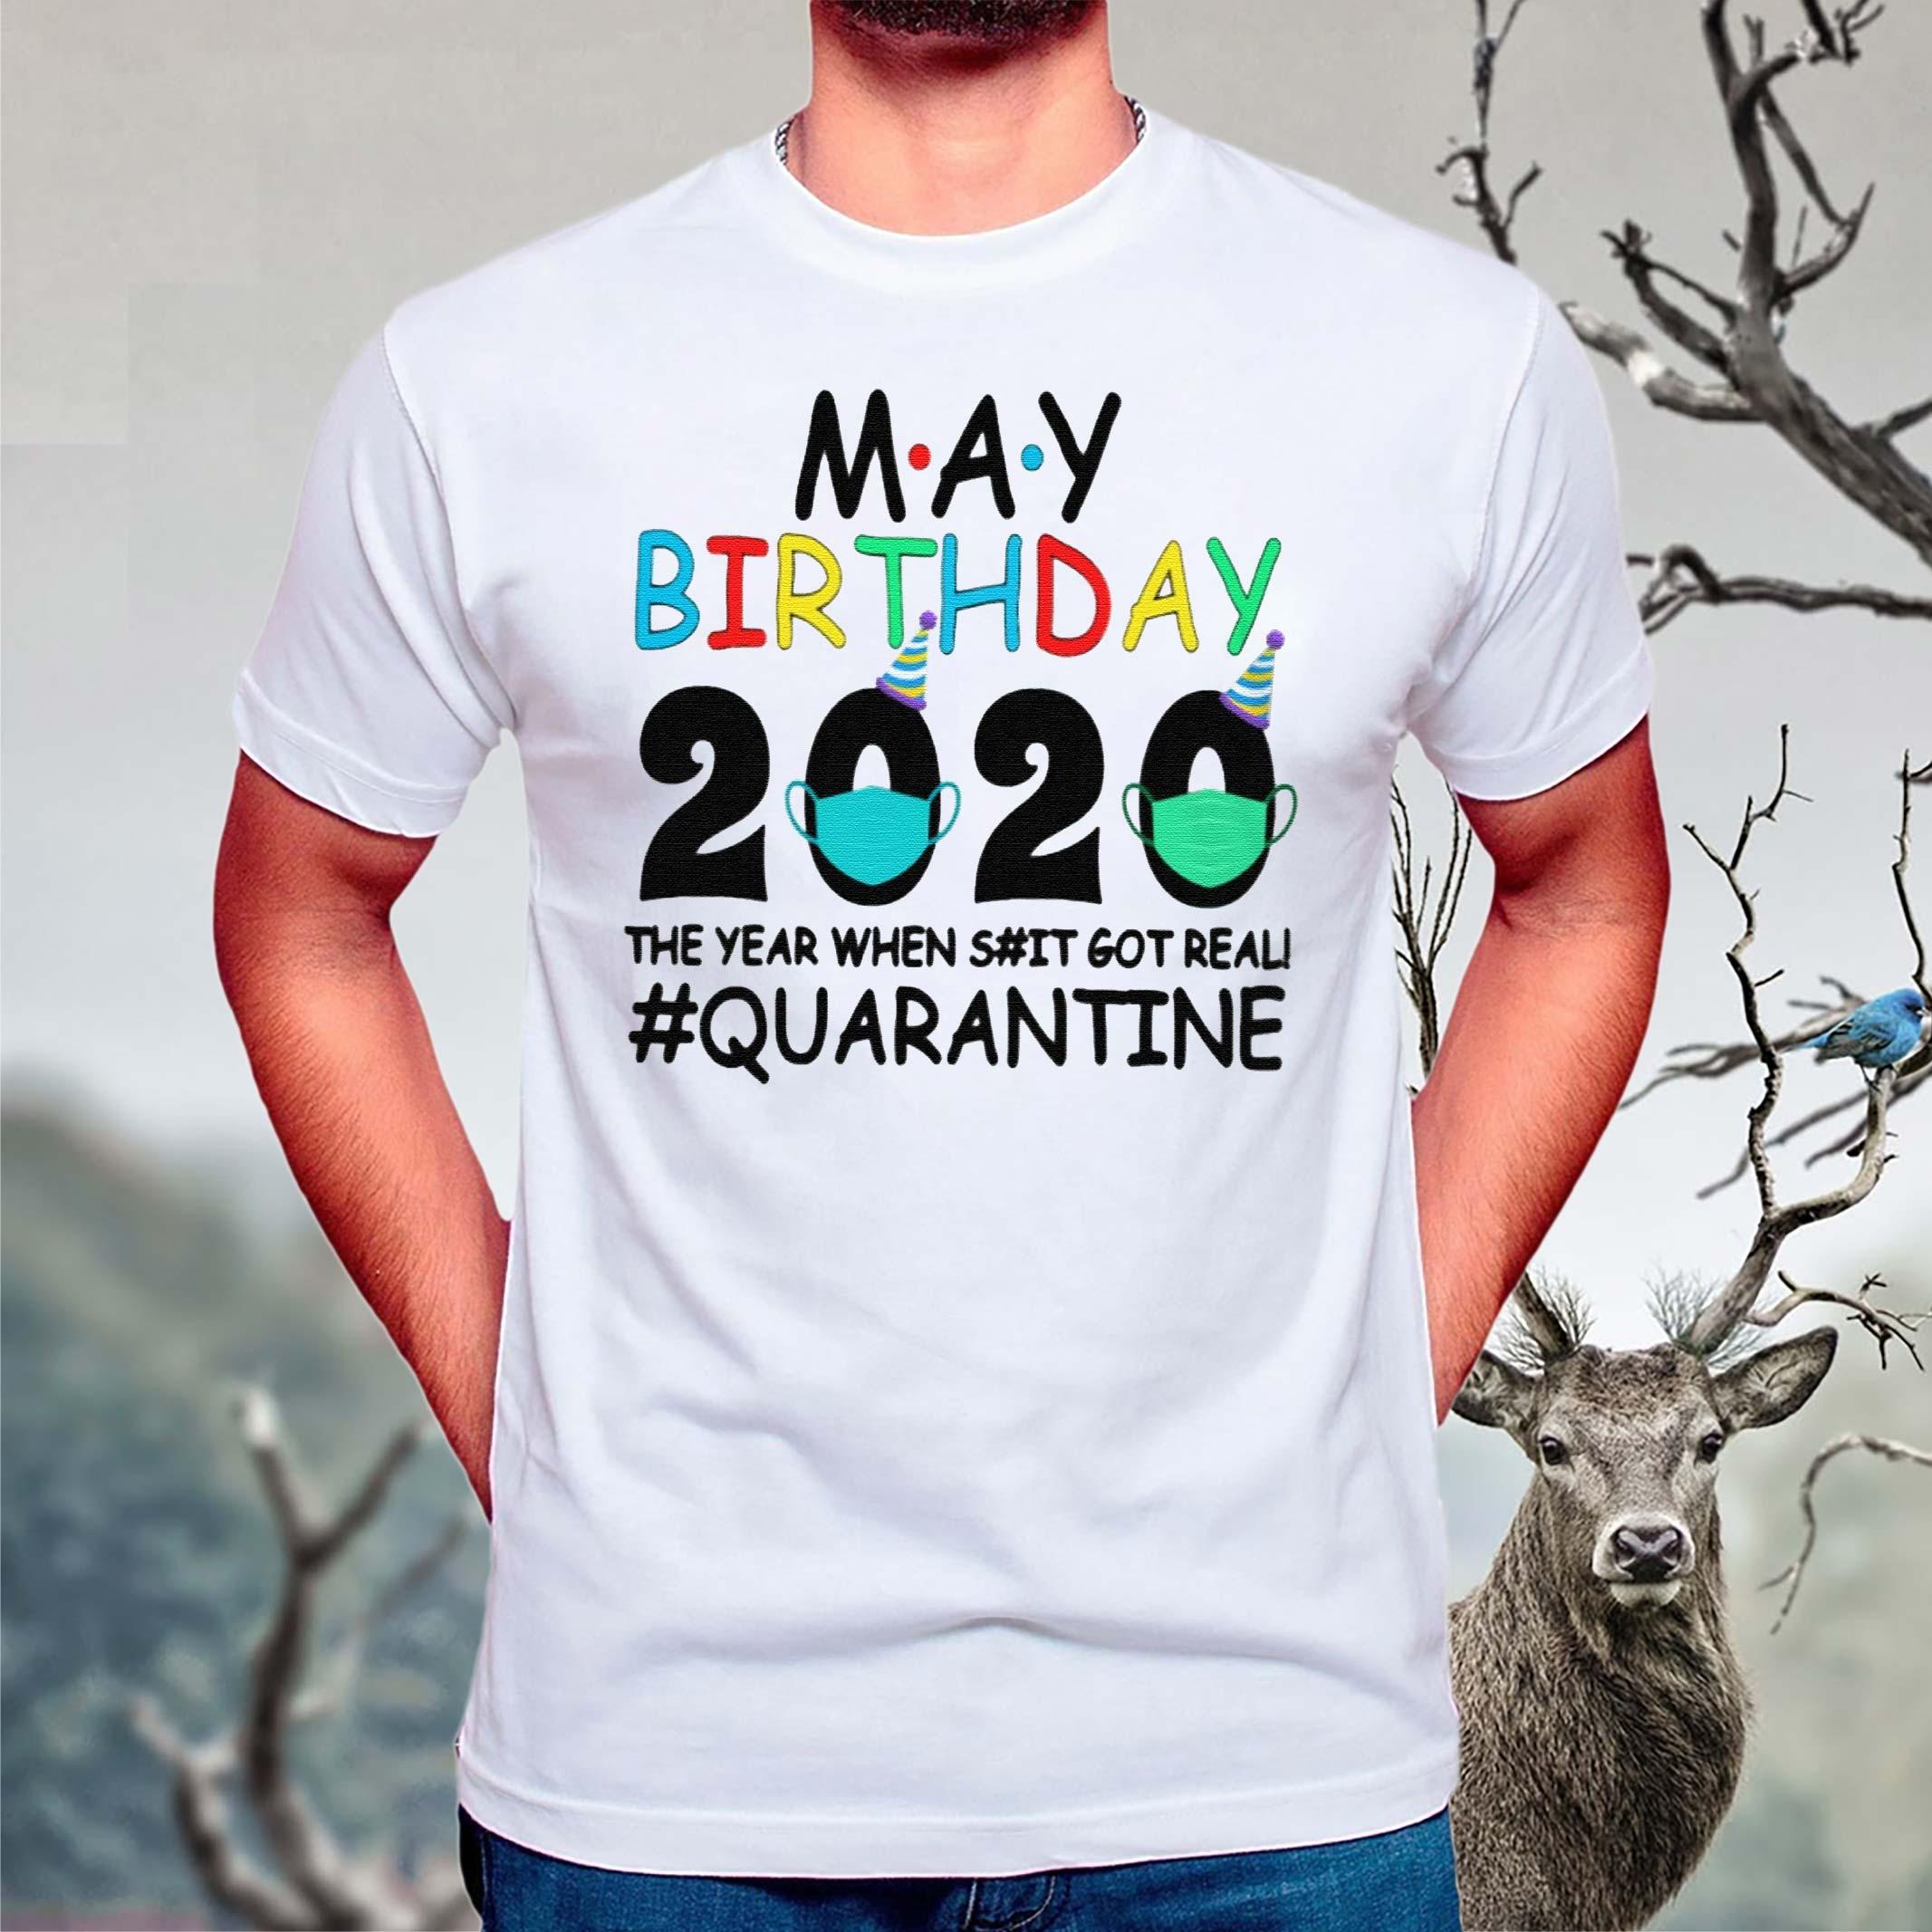 May-birthday-2020-the-year-when-shit-got-real-quarantined-tshirts